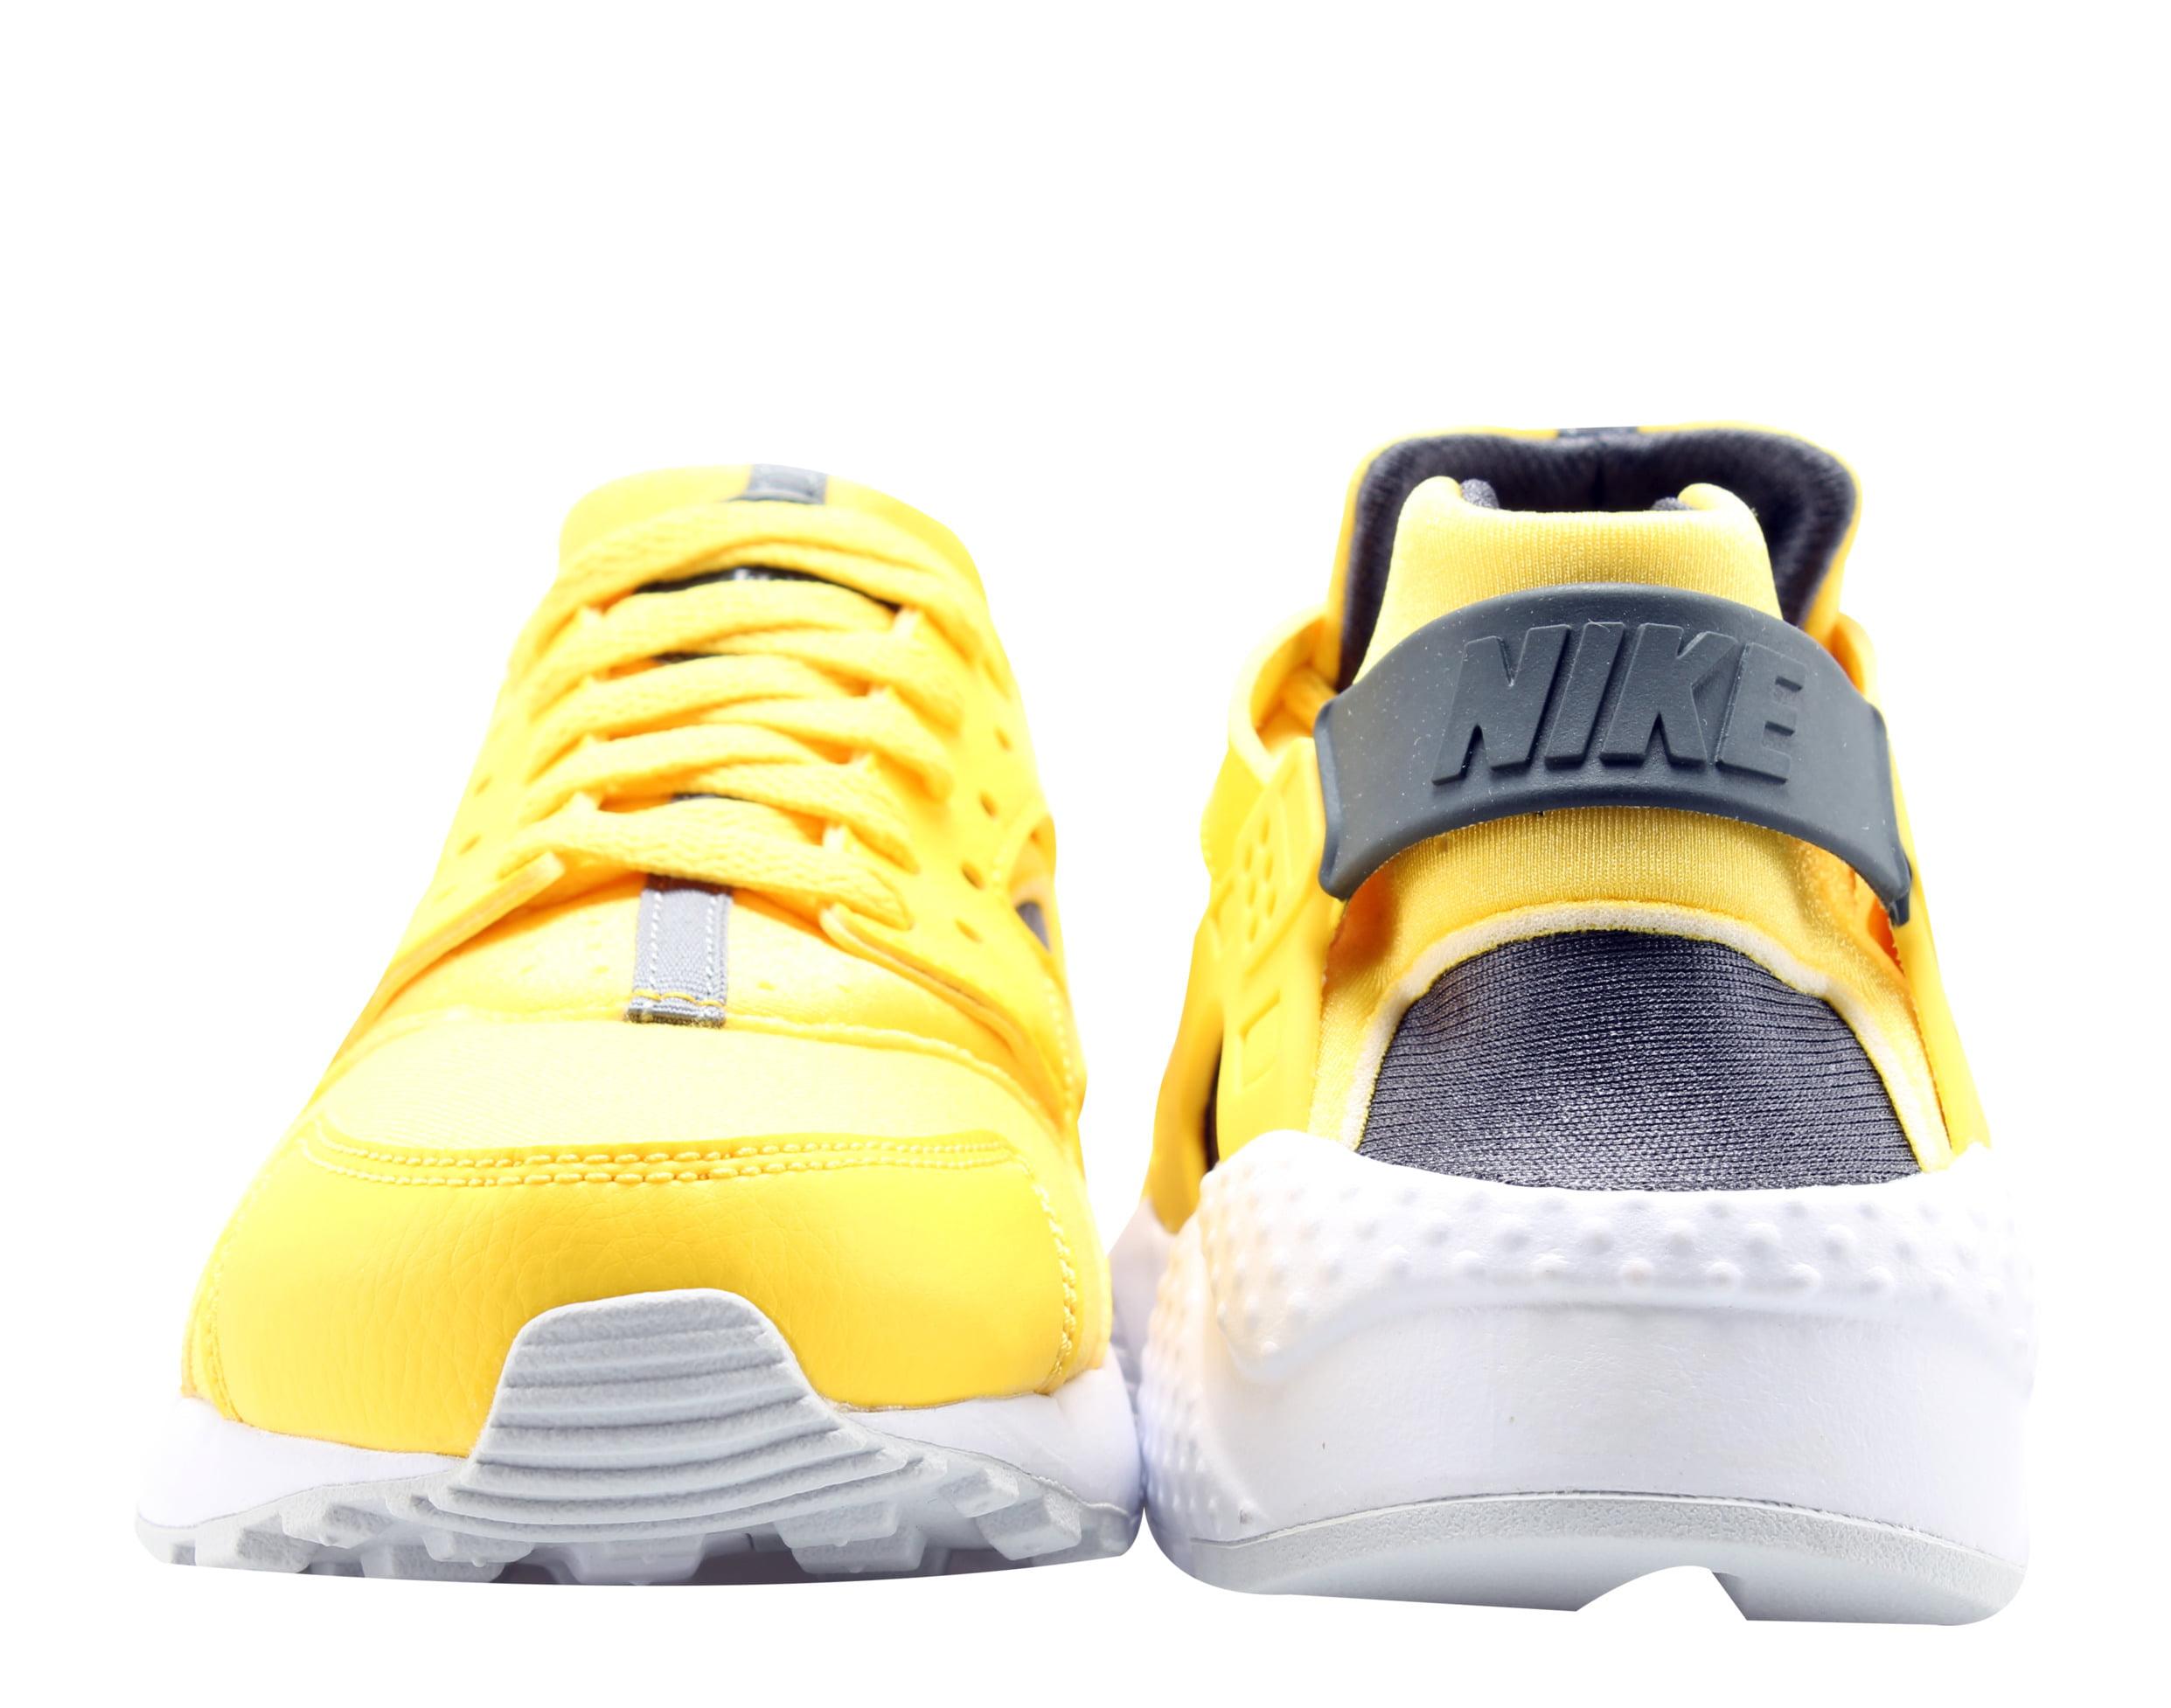 46ef3bfb77a3 Nike - Nike Huarache Run (GS) Yellow Anthracite-Wht Big Kids Running Shoes  654275-700 - Walmart.com